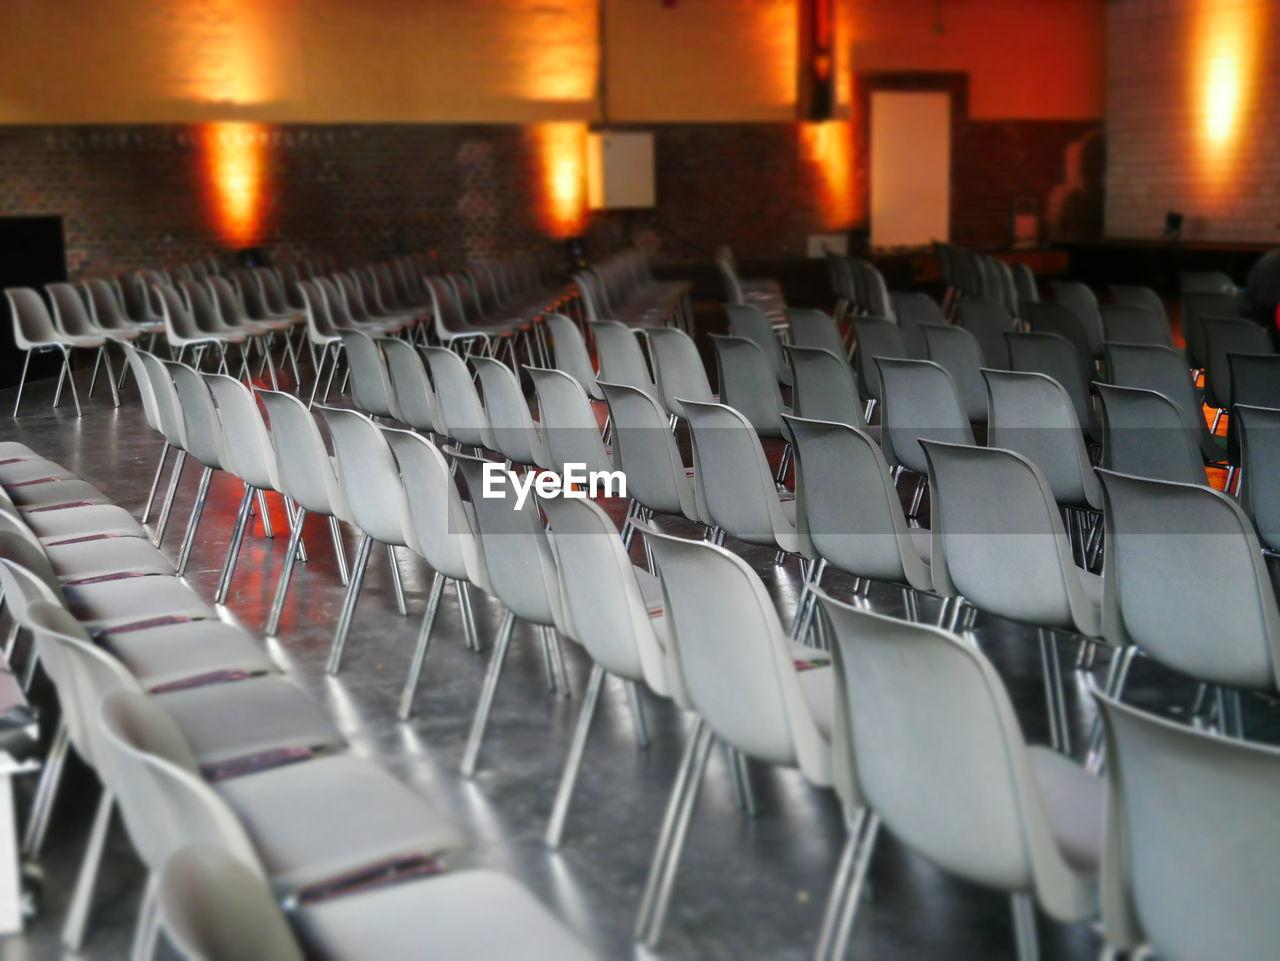 Empty chairs in illuminated seminar hall